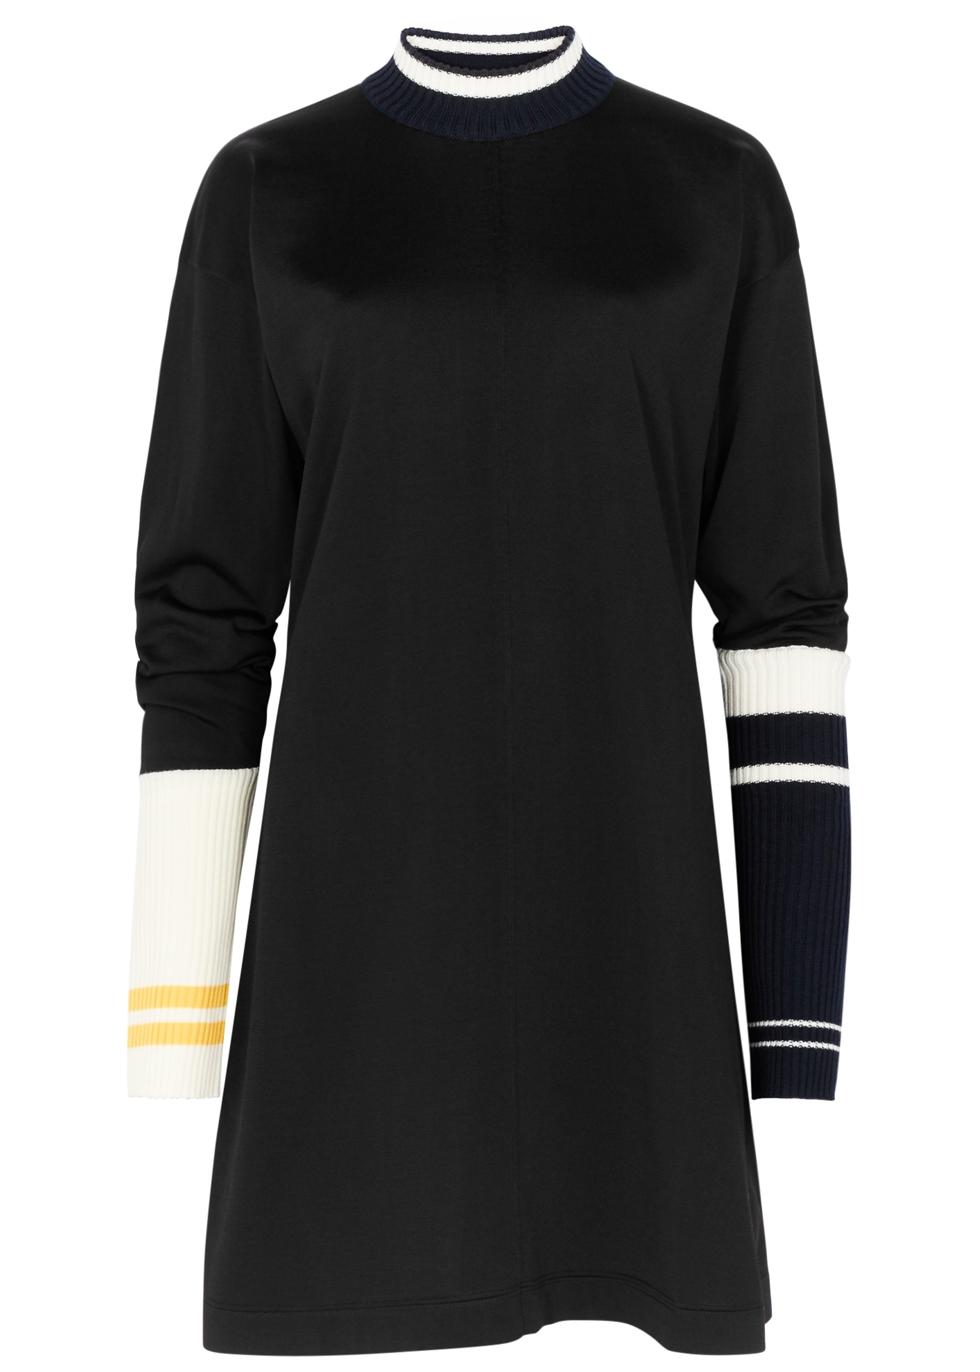 CALVIN KLEIN 205W39NYC BLACK STRIPED FINE-KNIT DRESS